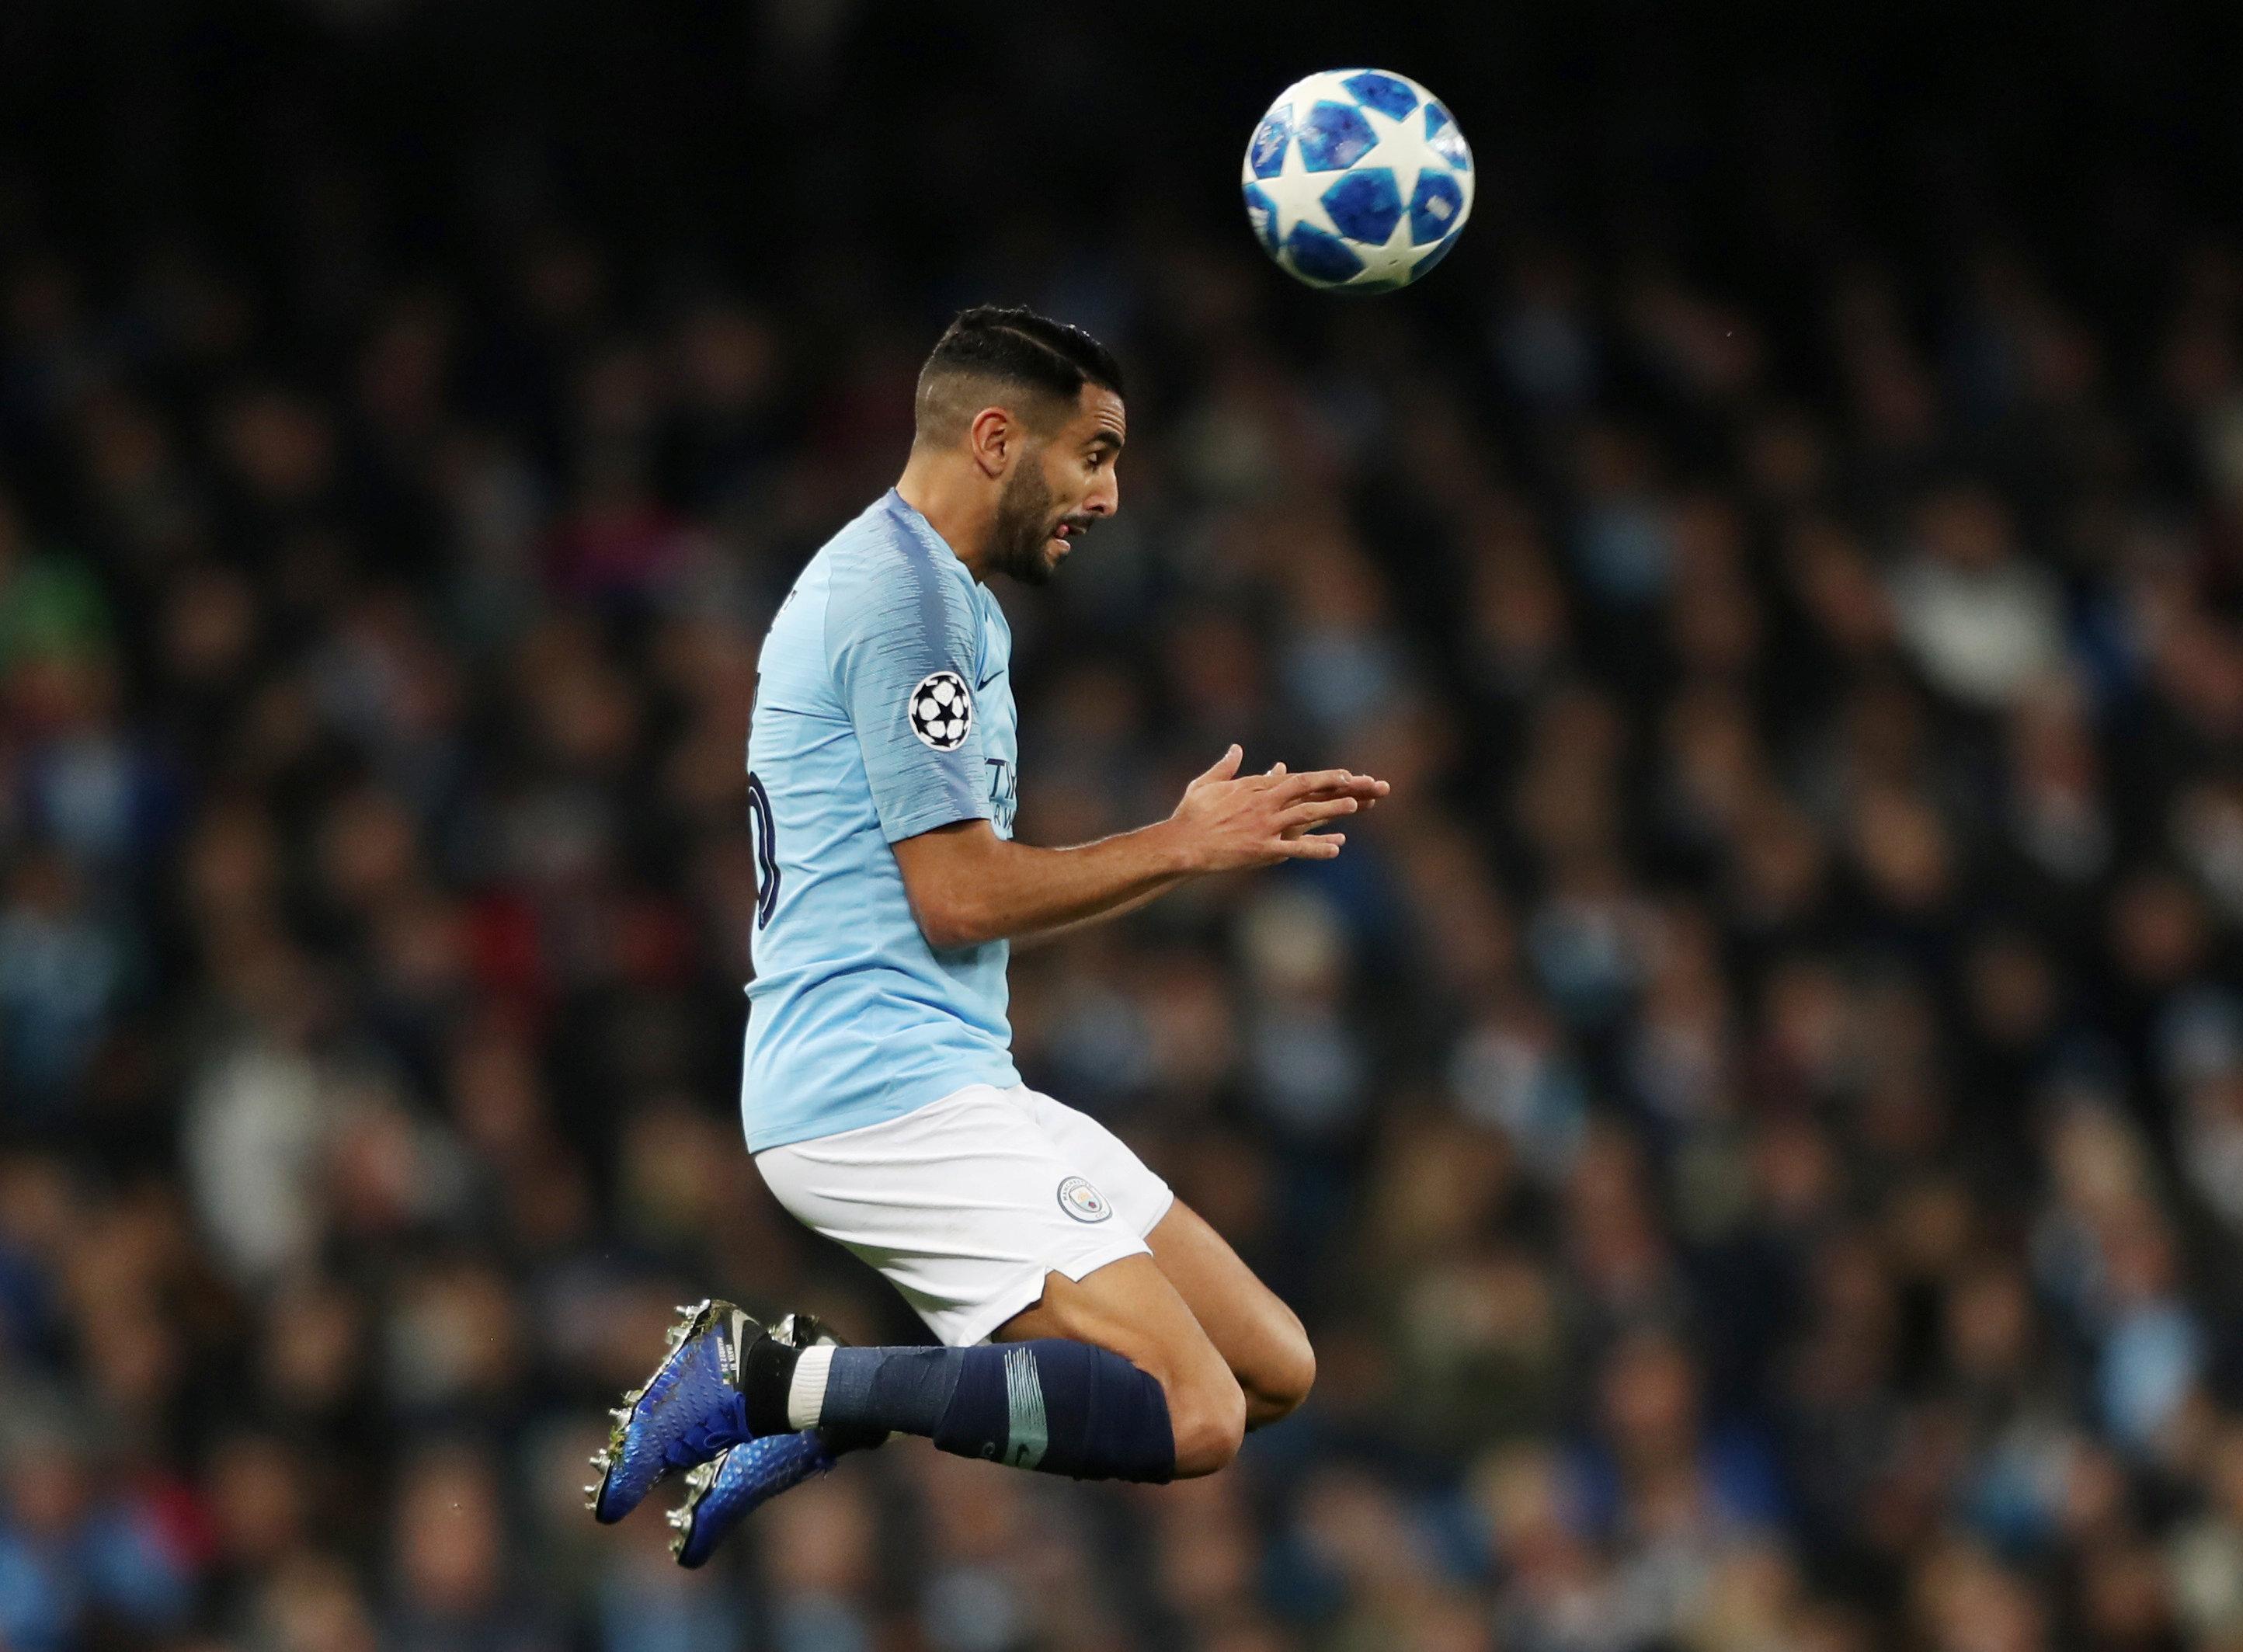 Football - Etranger - Premier League: Watford-Manchester City en direct